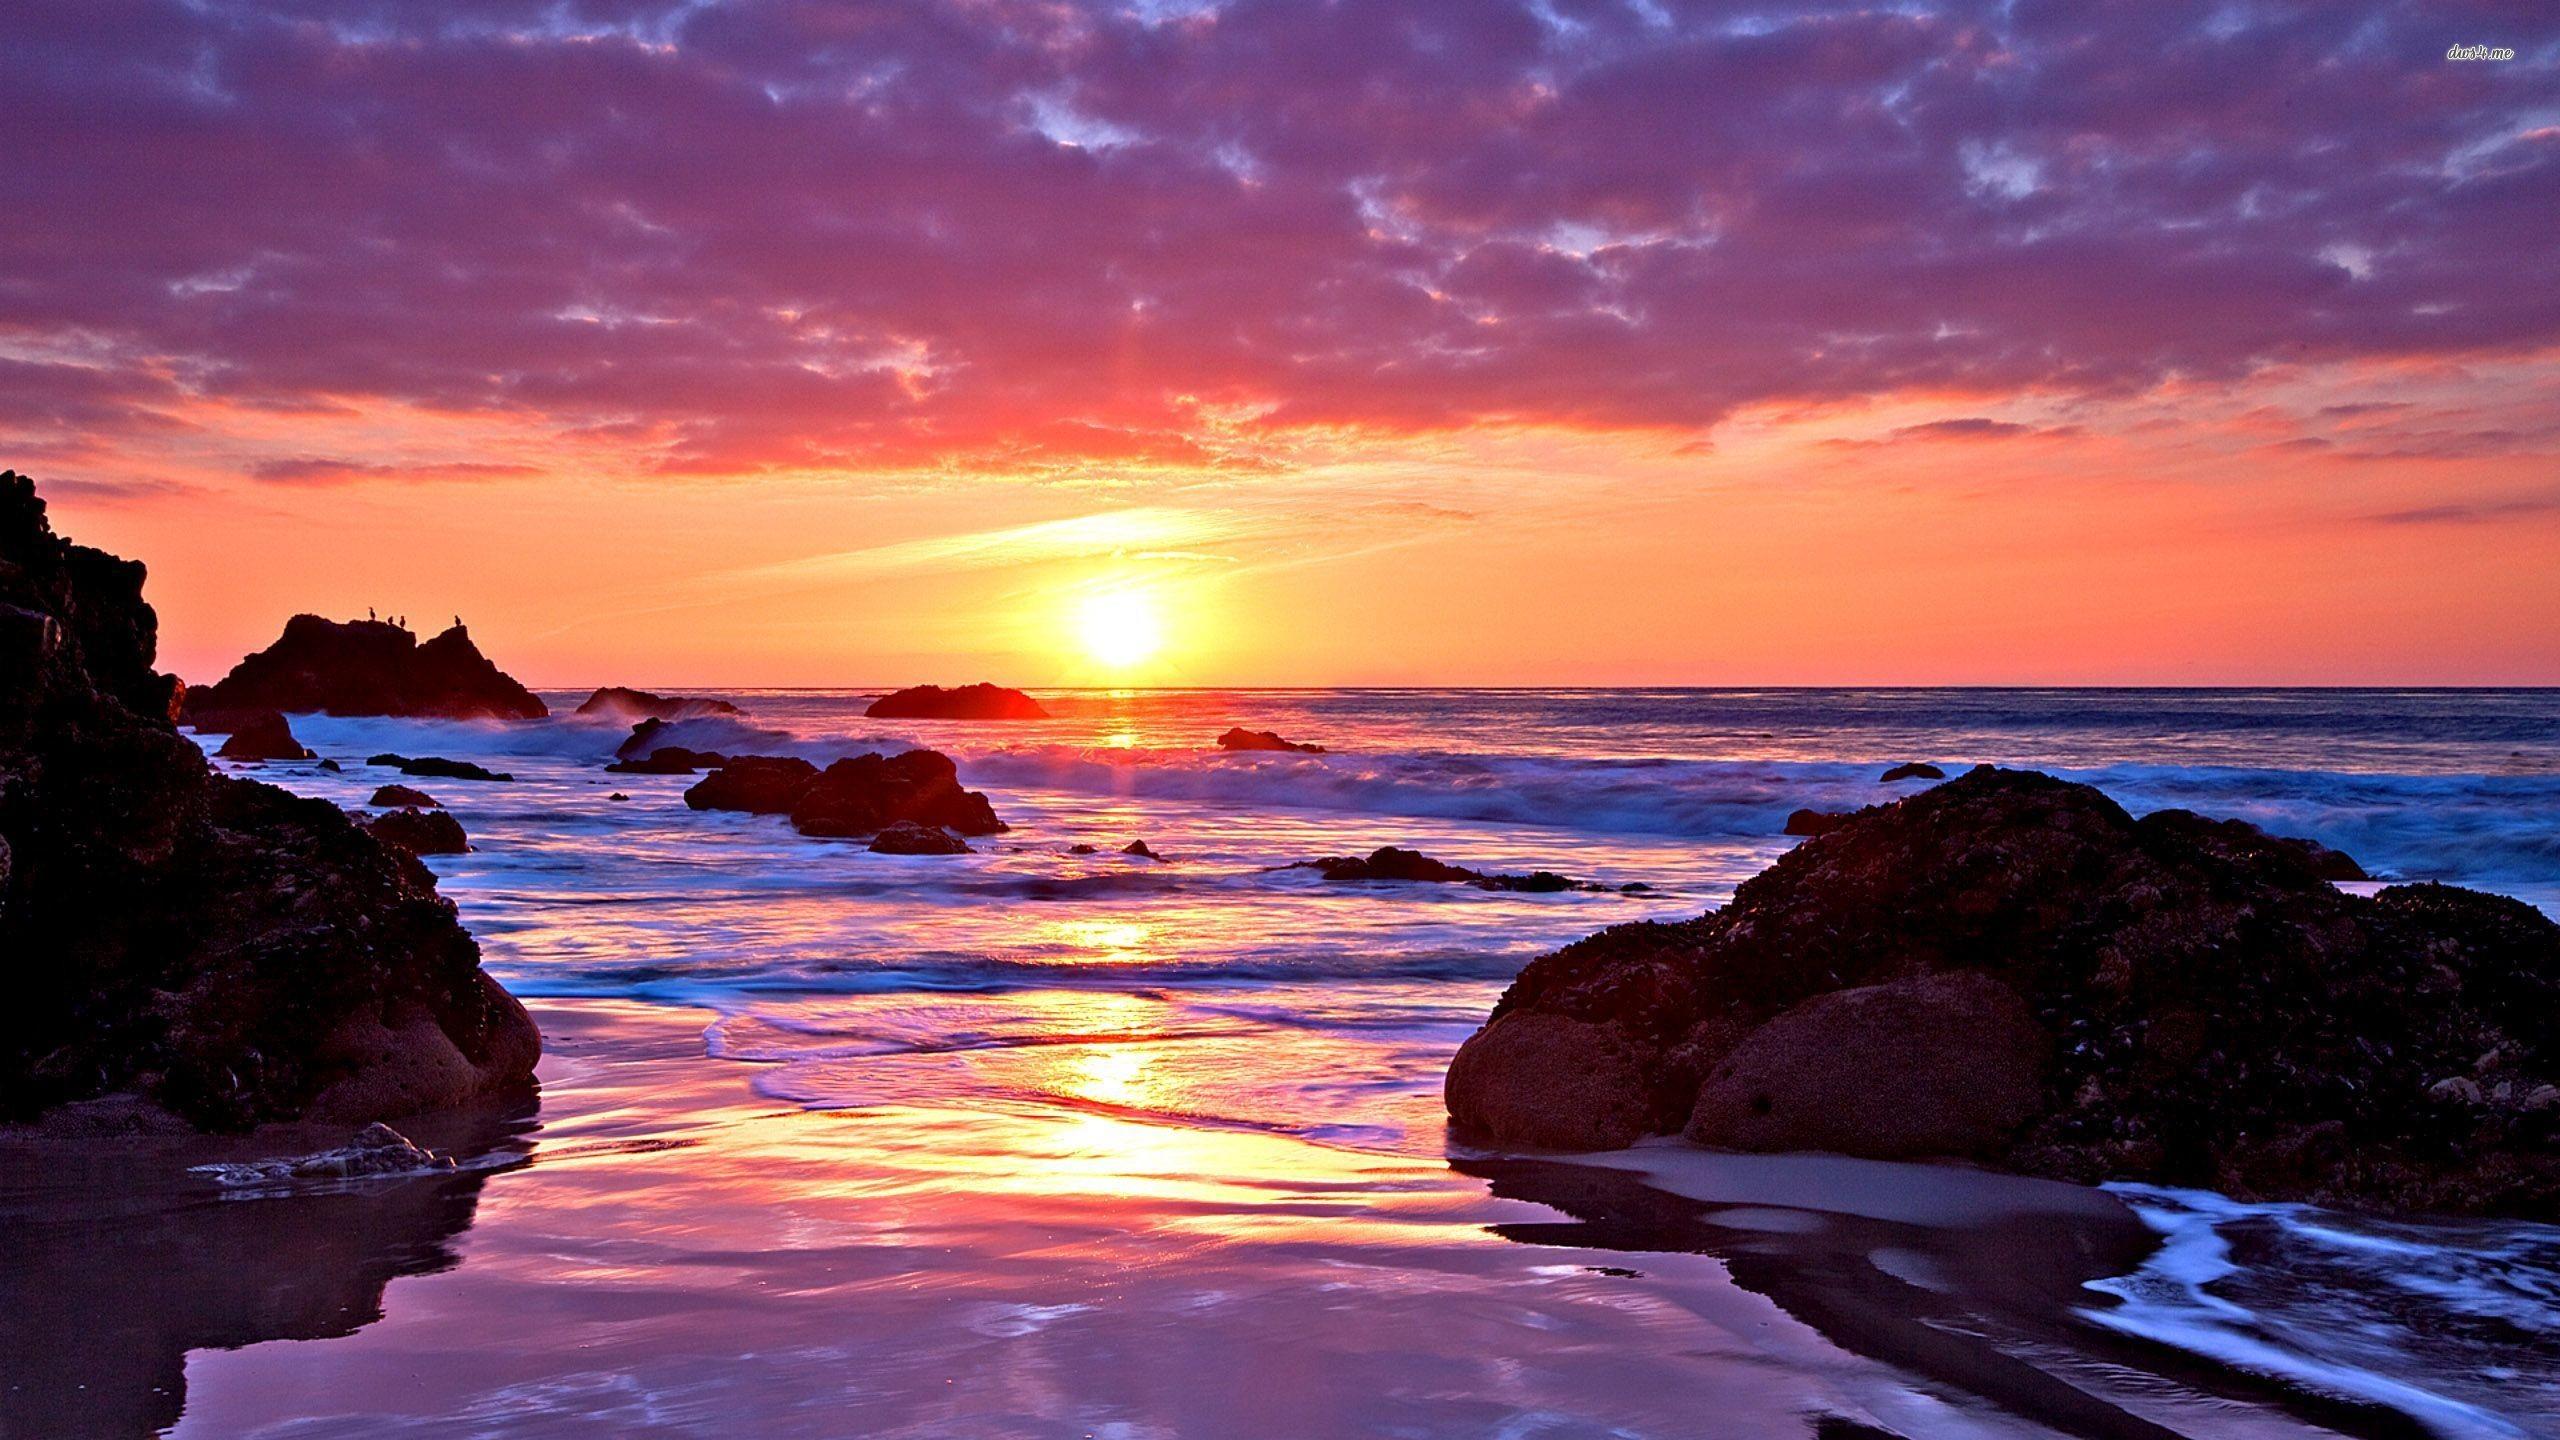 Res: 2560x1440, Ocean Sunset Wallpapers Desktop Background Mountain Lake